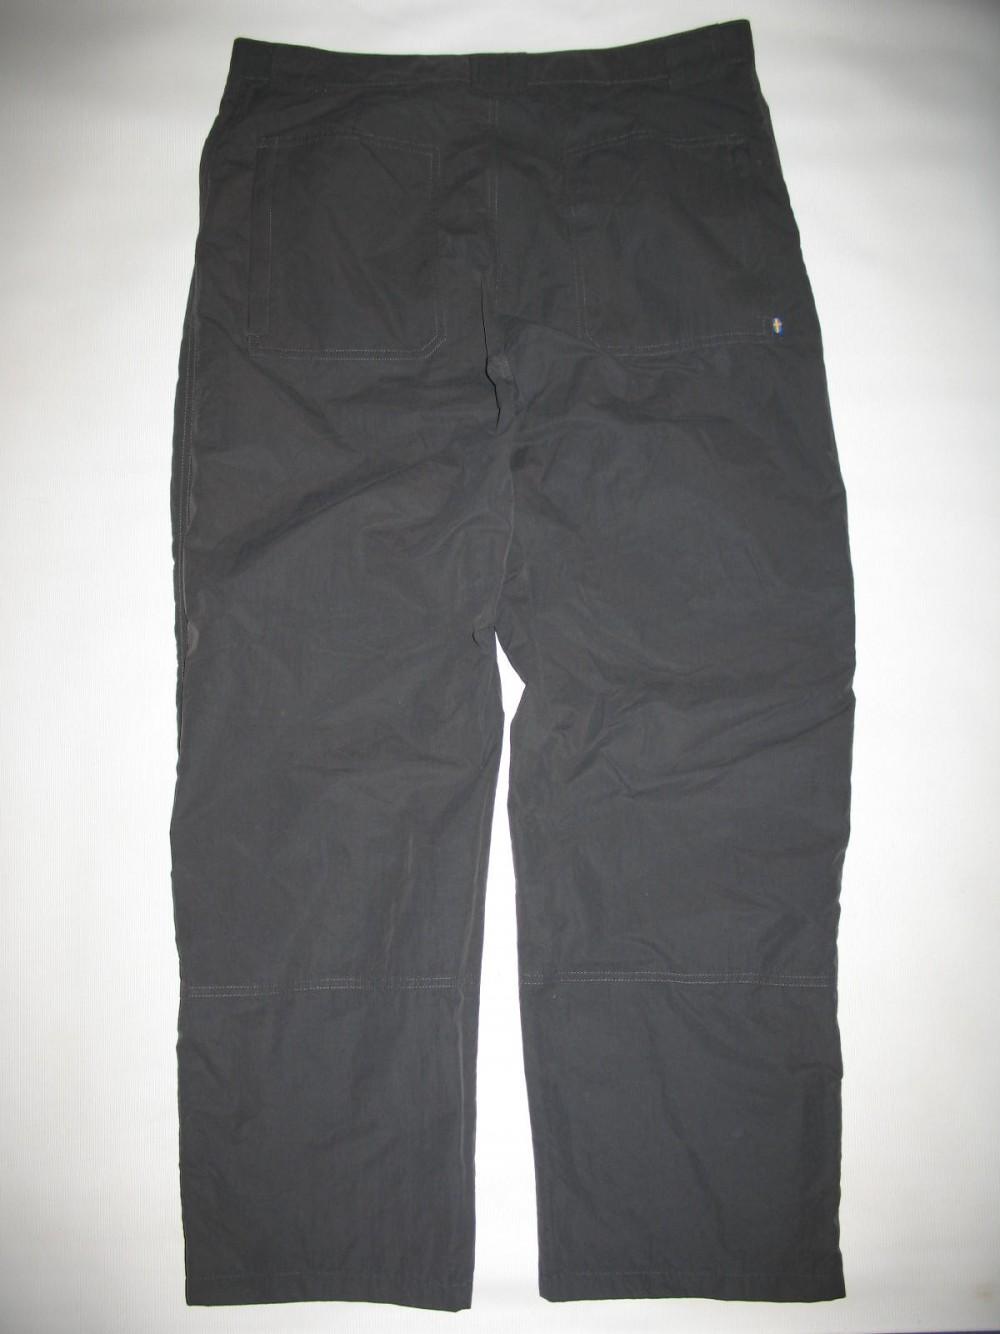 Штаны FJALLRAVEN outdoor pant (размер 52-L/XL) - 1